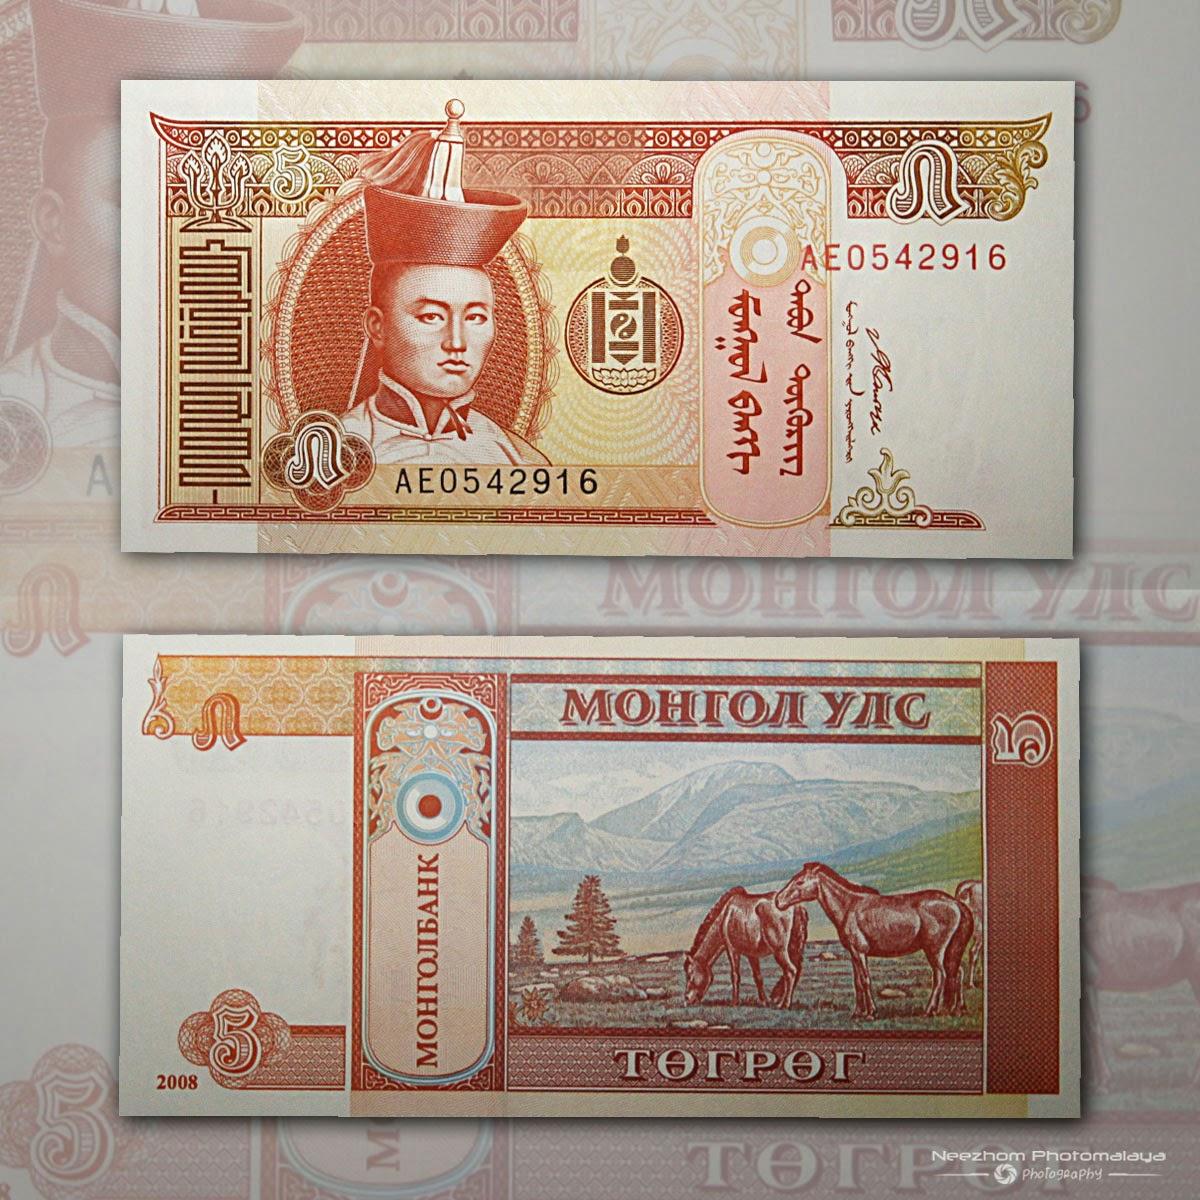 Mongolia banknote 5 Tugrik 2008